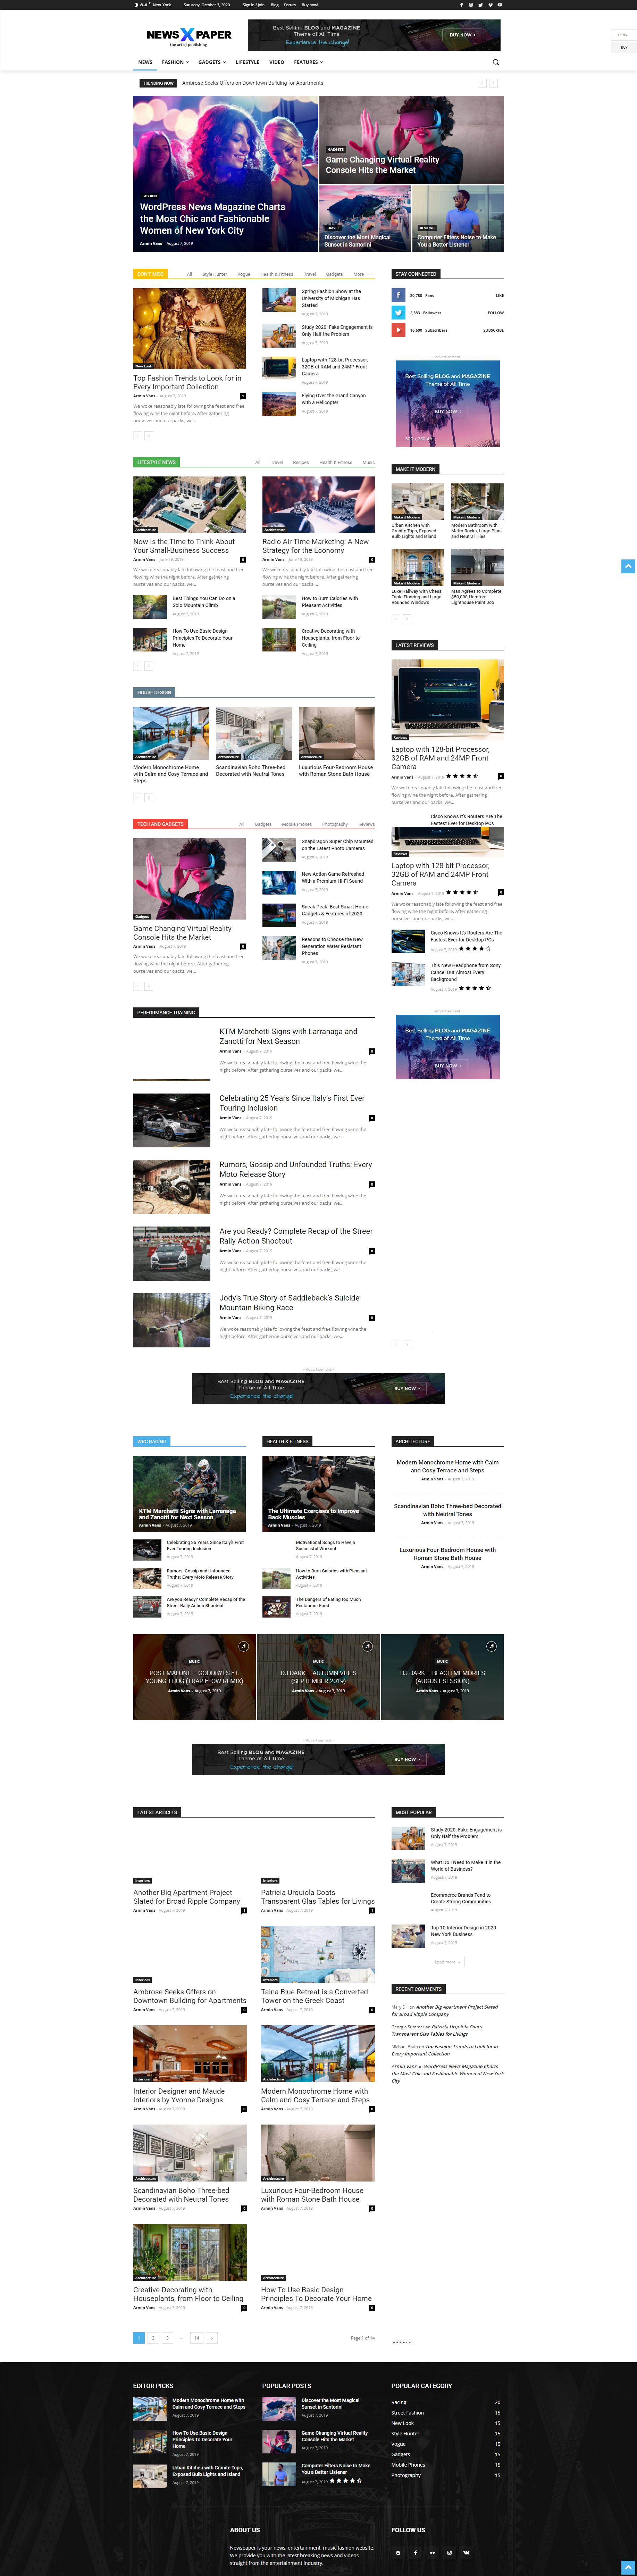 jasa buat newspaper online